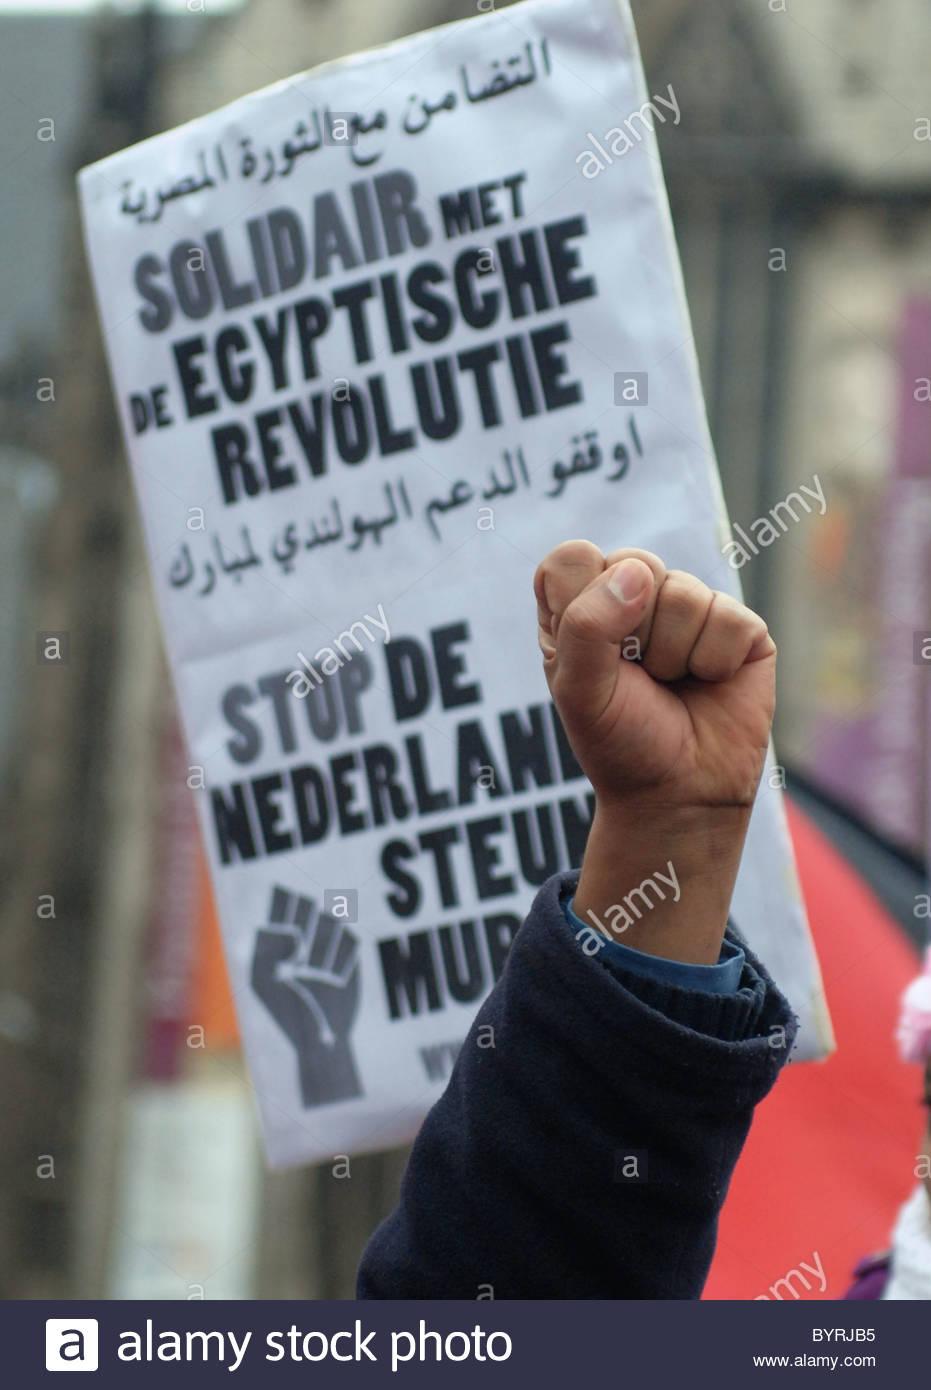 Amsterdam The Netherlands 5-2-2011: Anti Mubarak demo on the Dam. - Stock Image